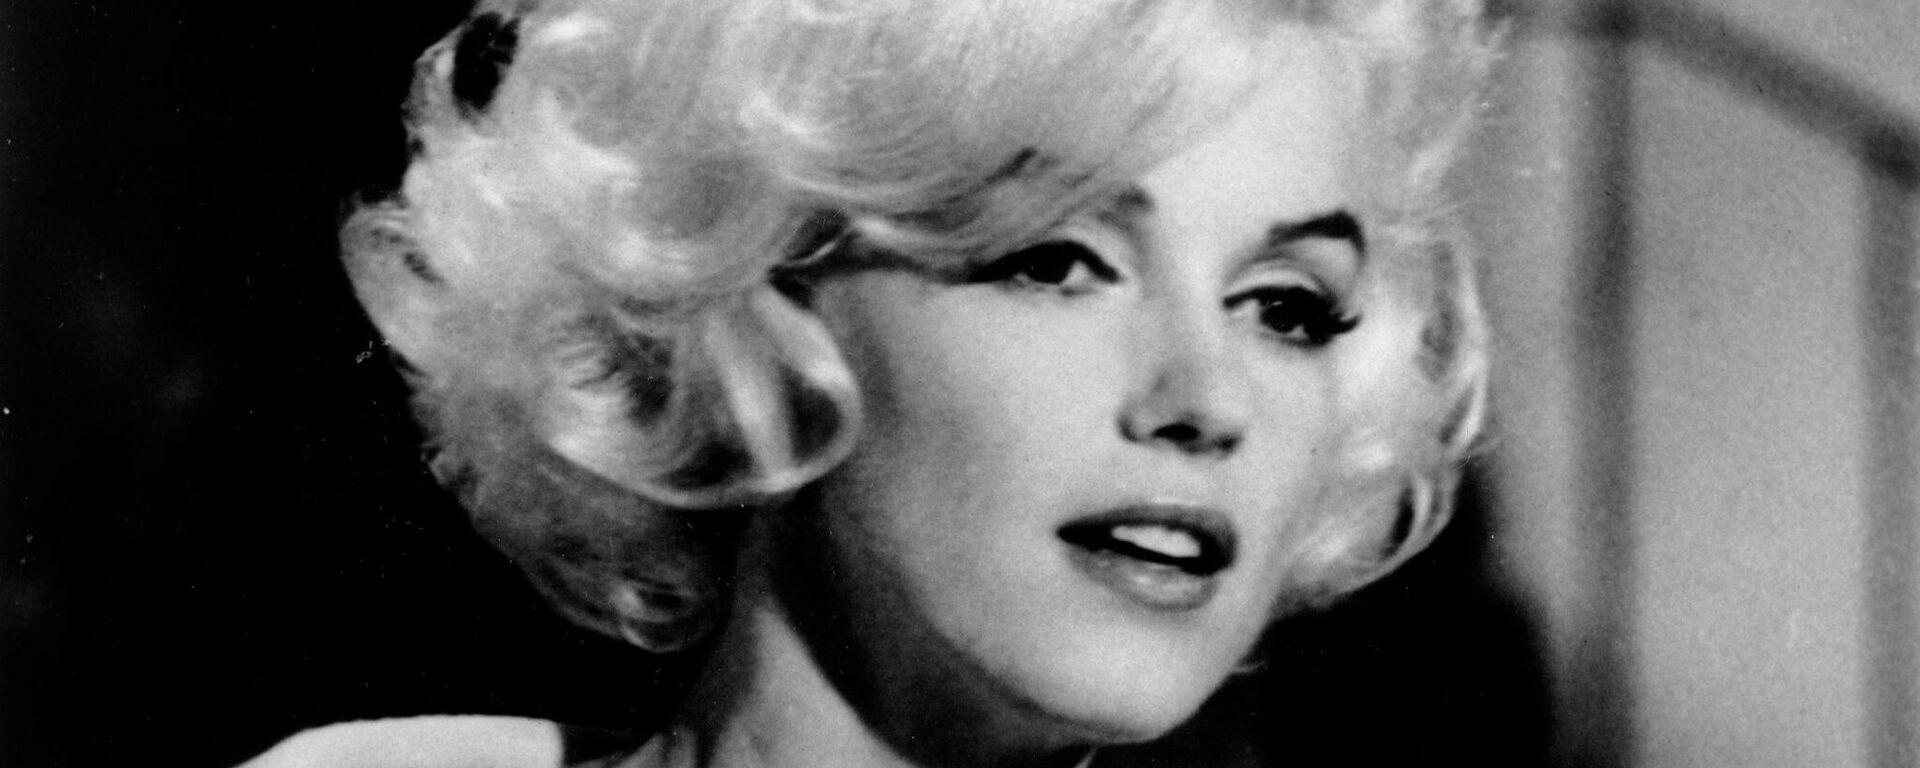 Marilyn Monroe, actriz estadounidense - Sputnik Mundo, 1920, 04.07.2021